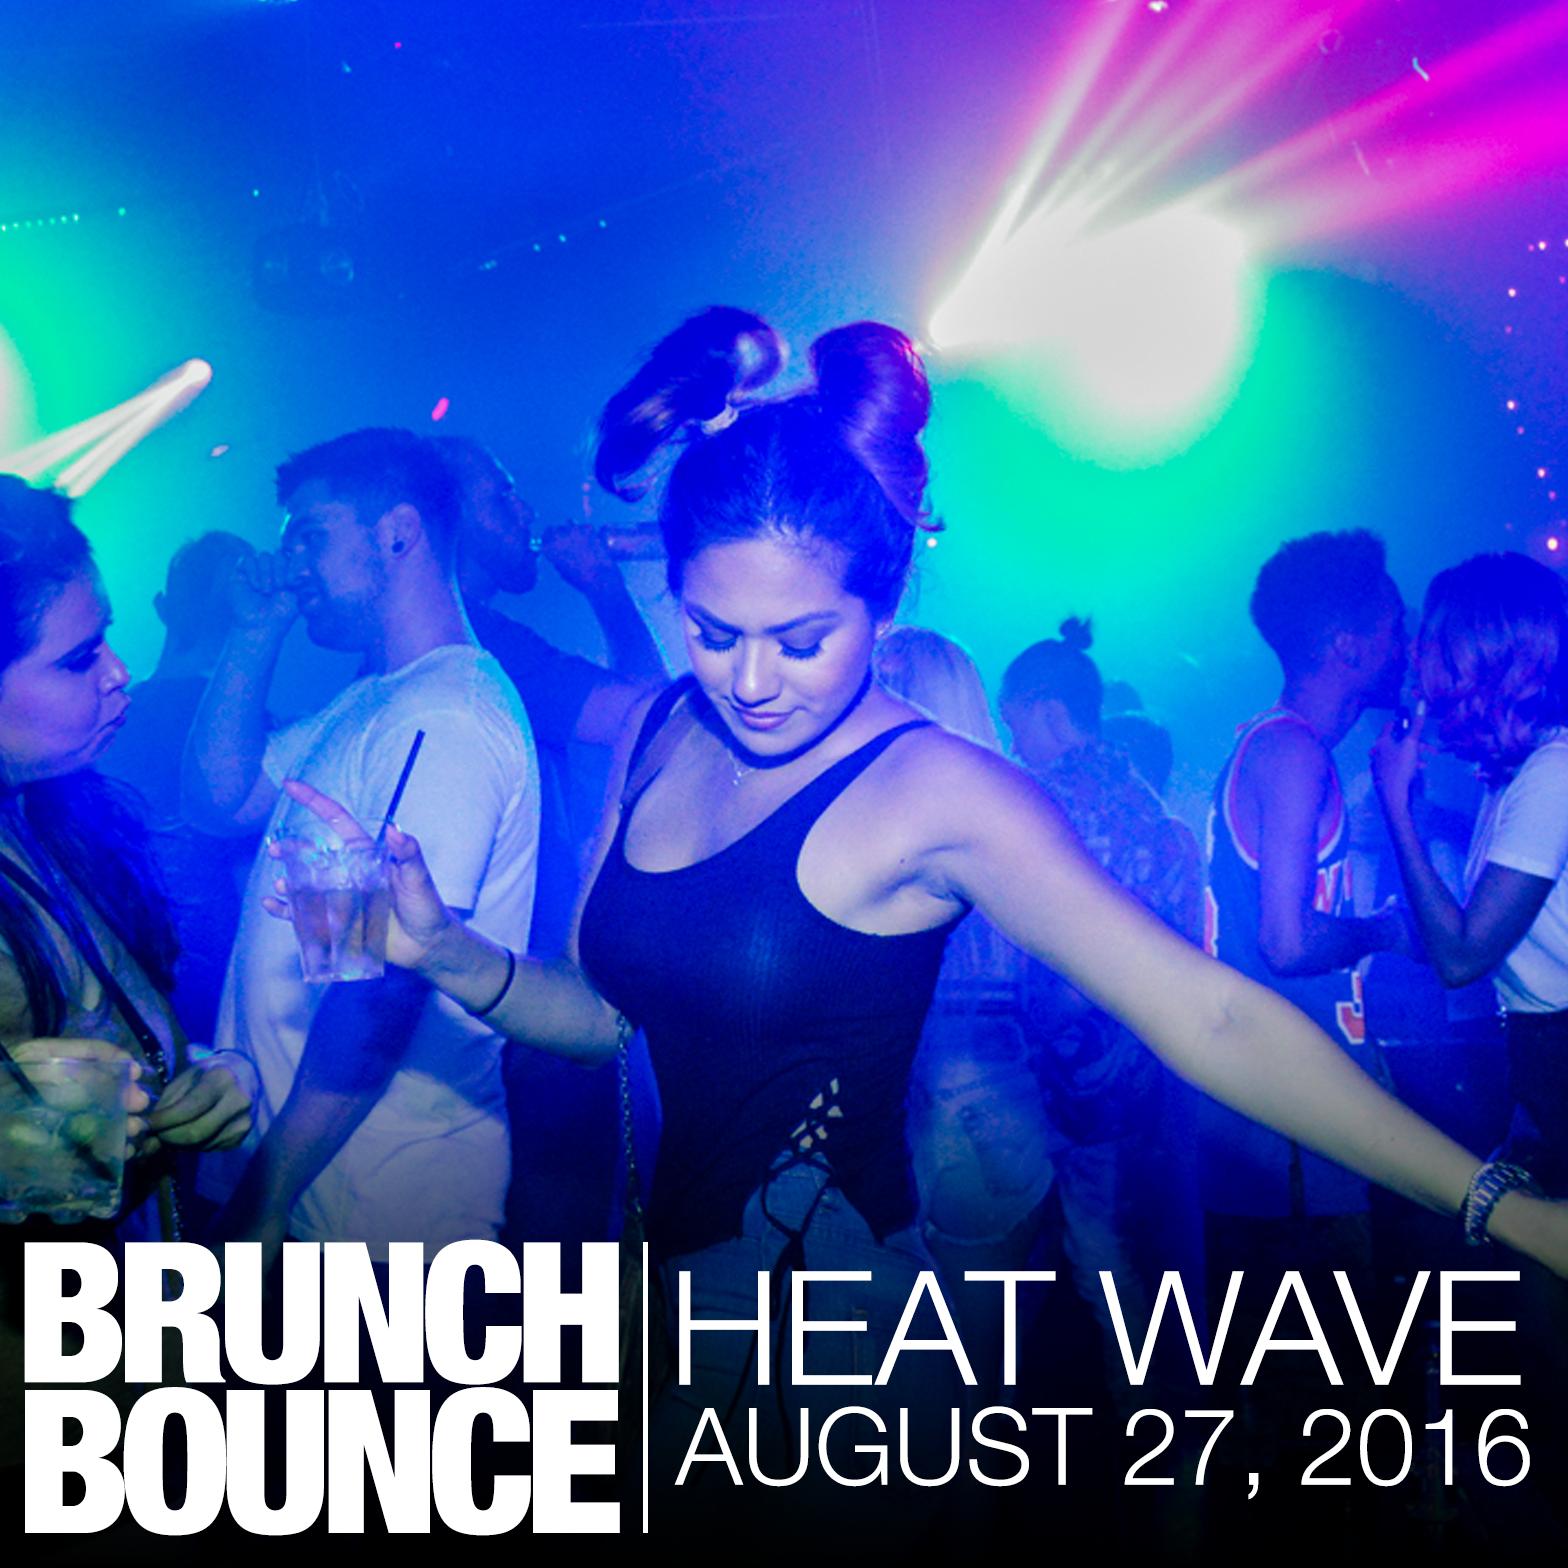 Brunch Bounce Heat Wave Los Angeles 8.27.16